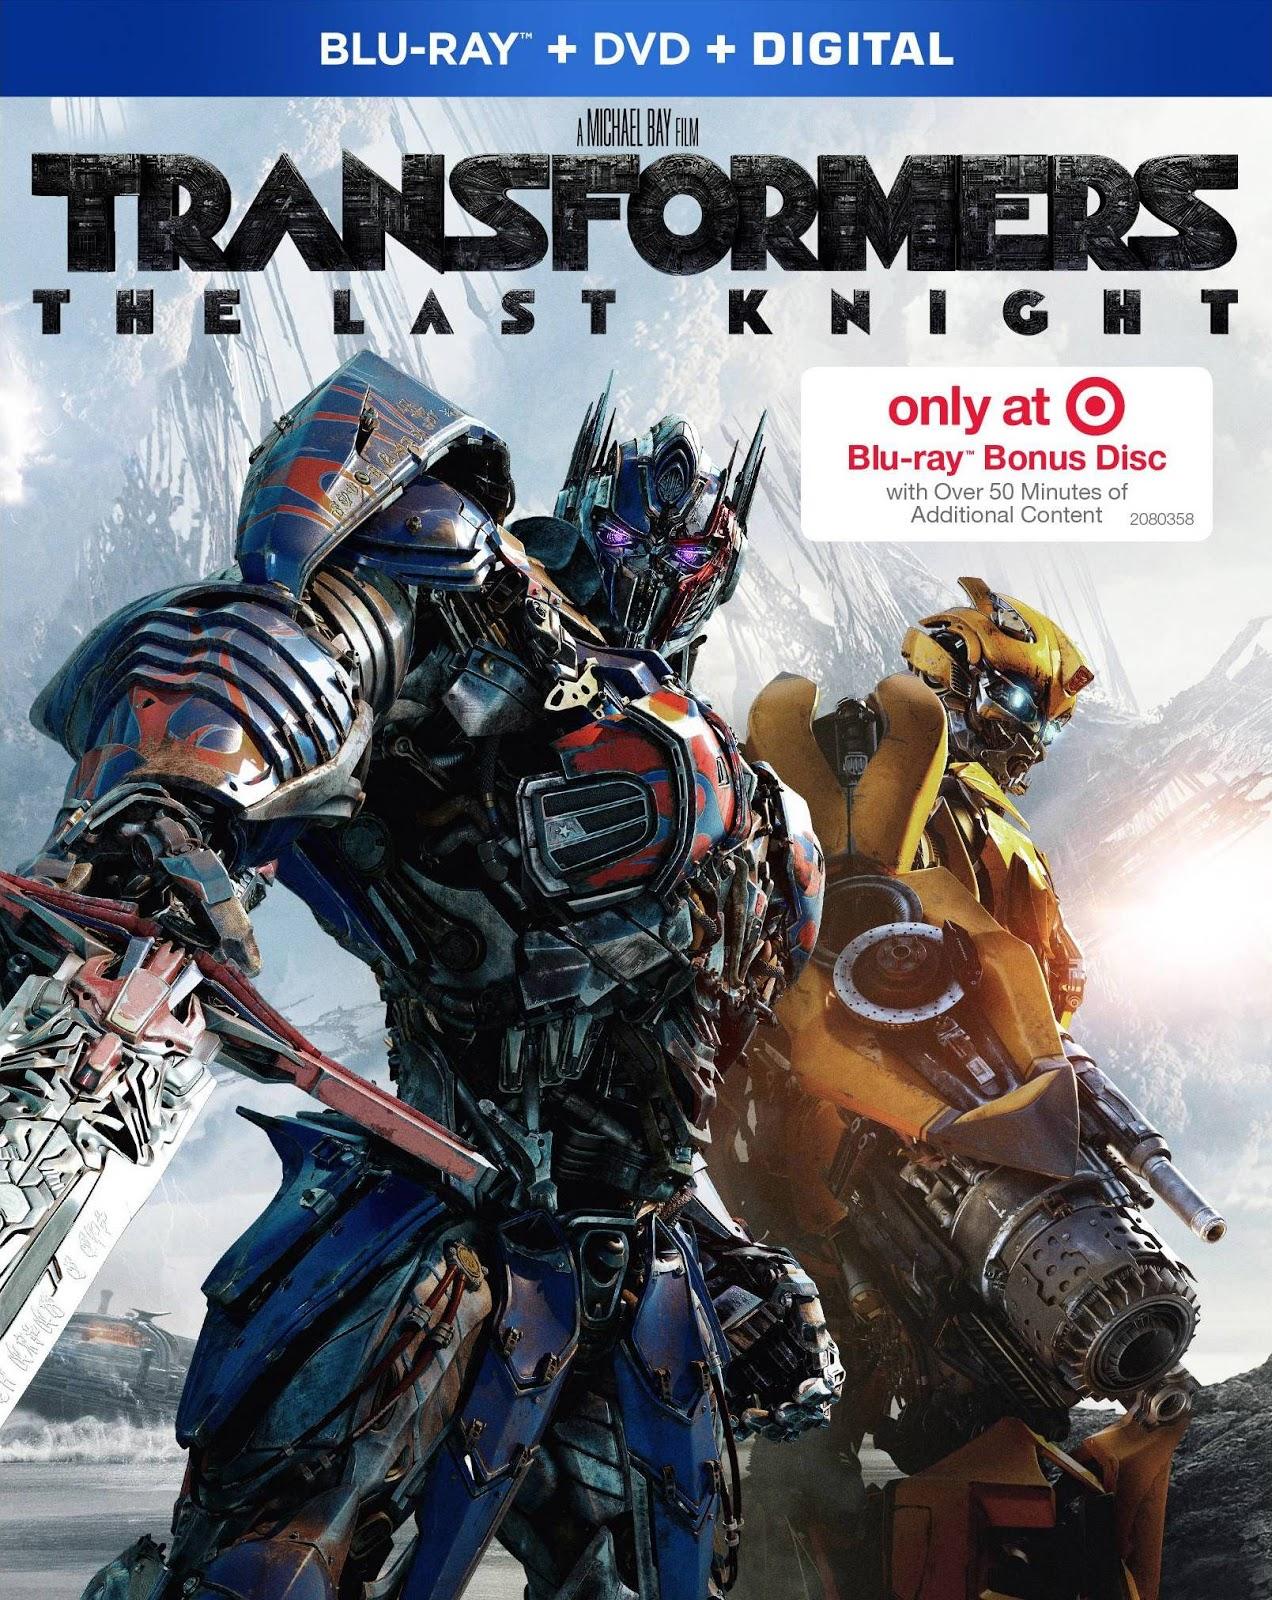 Transformers El Ultimo Caballero 1080p BD25 LATINO